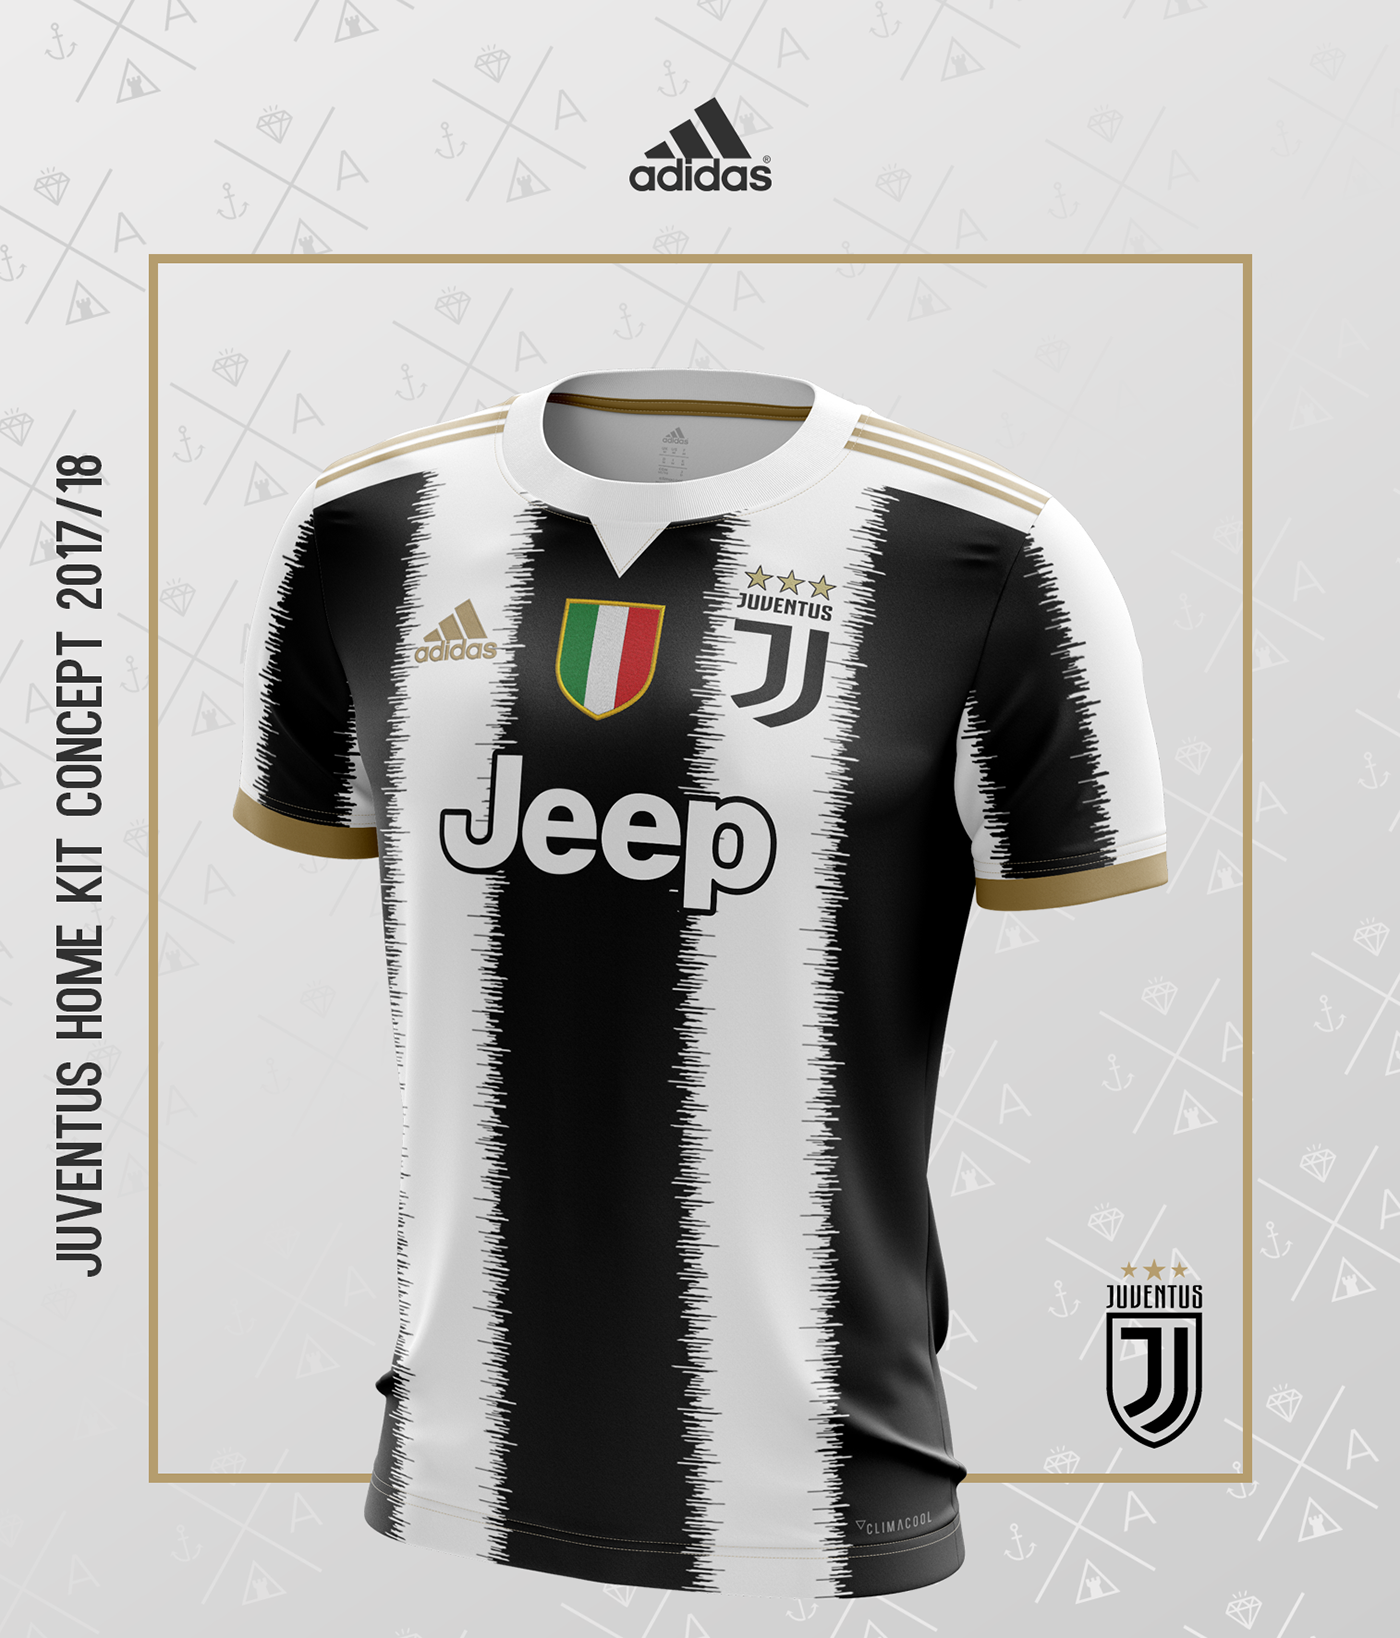 fd4410c8b Kit Juventus 2019 – Idea di immagine del club fc